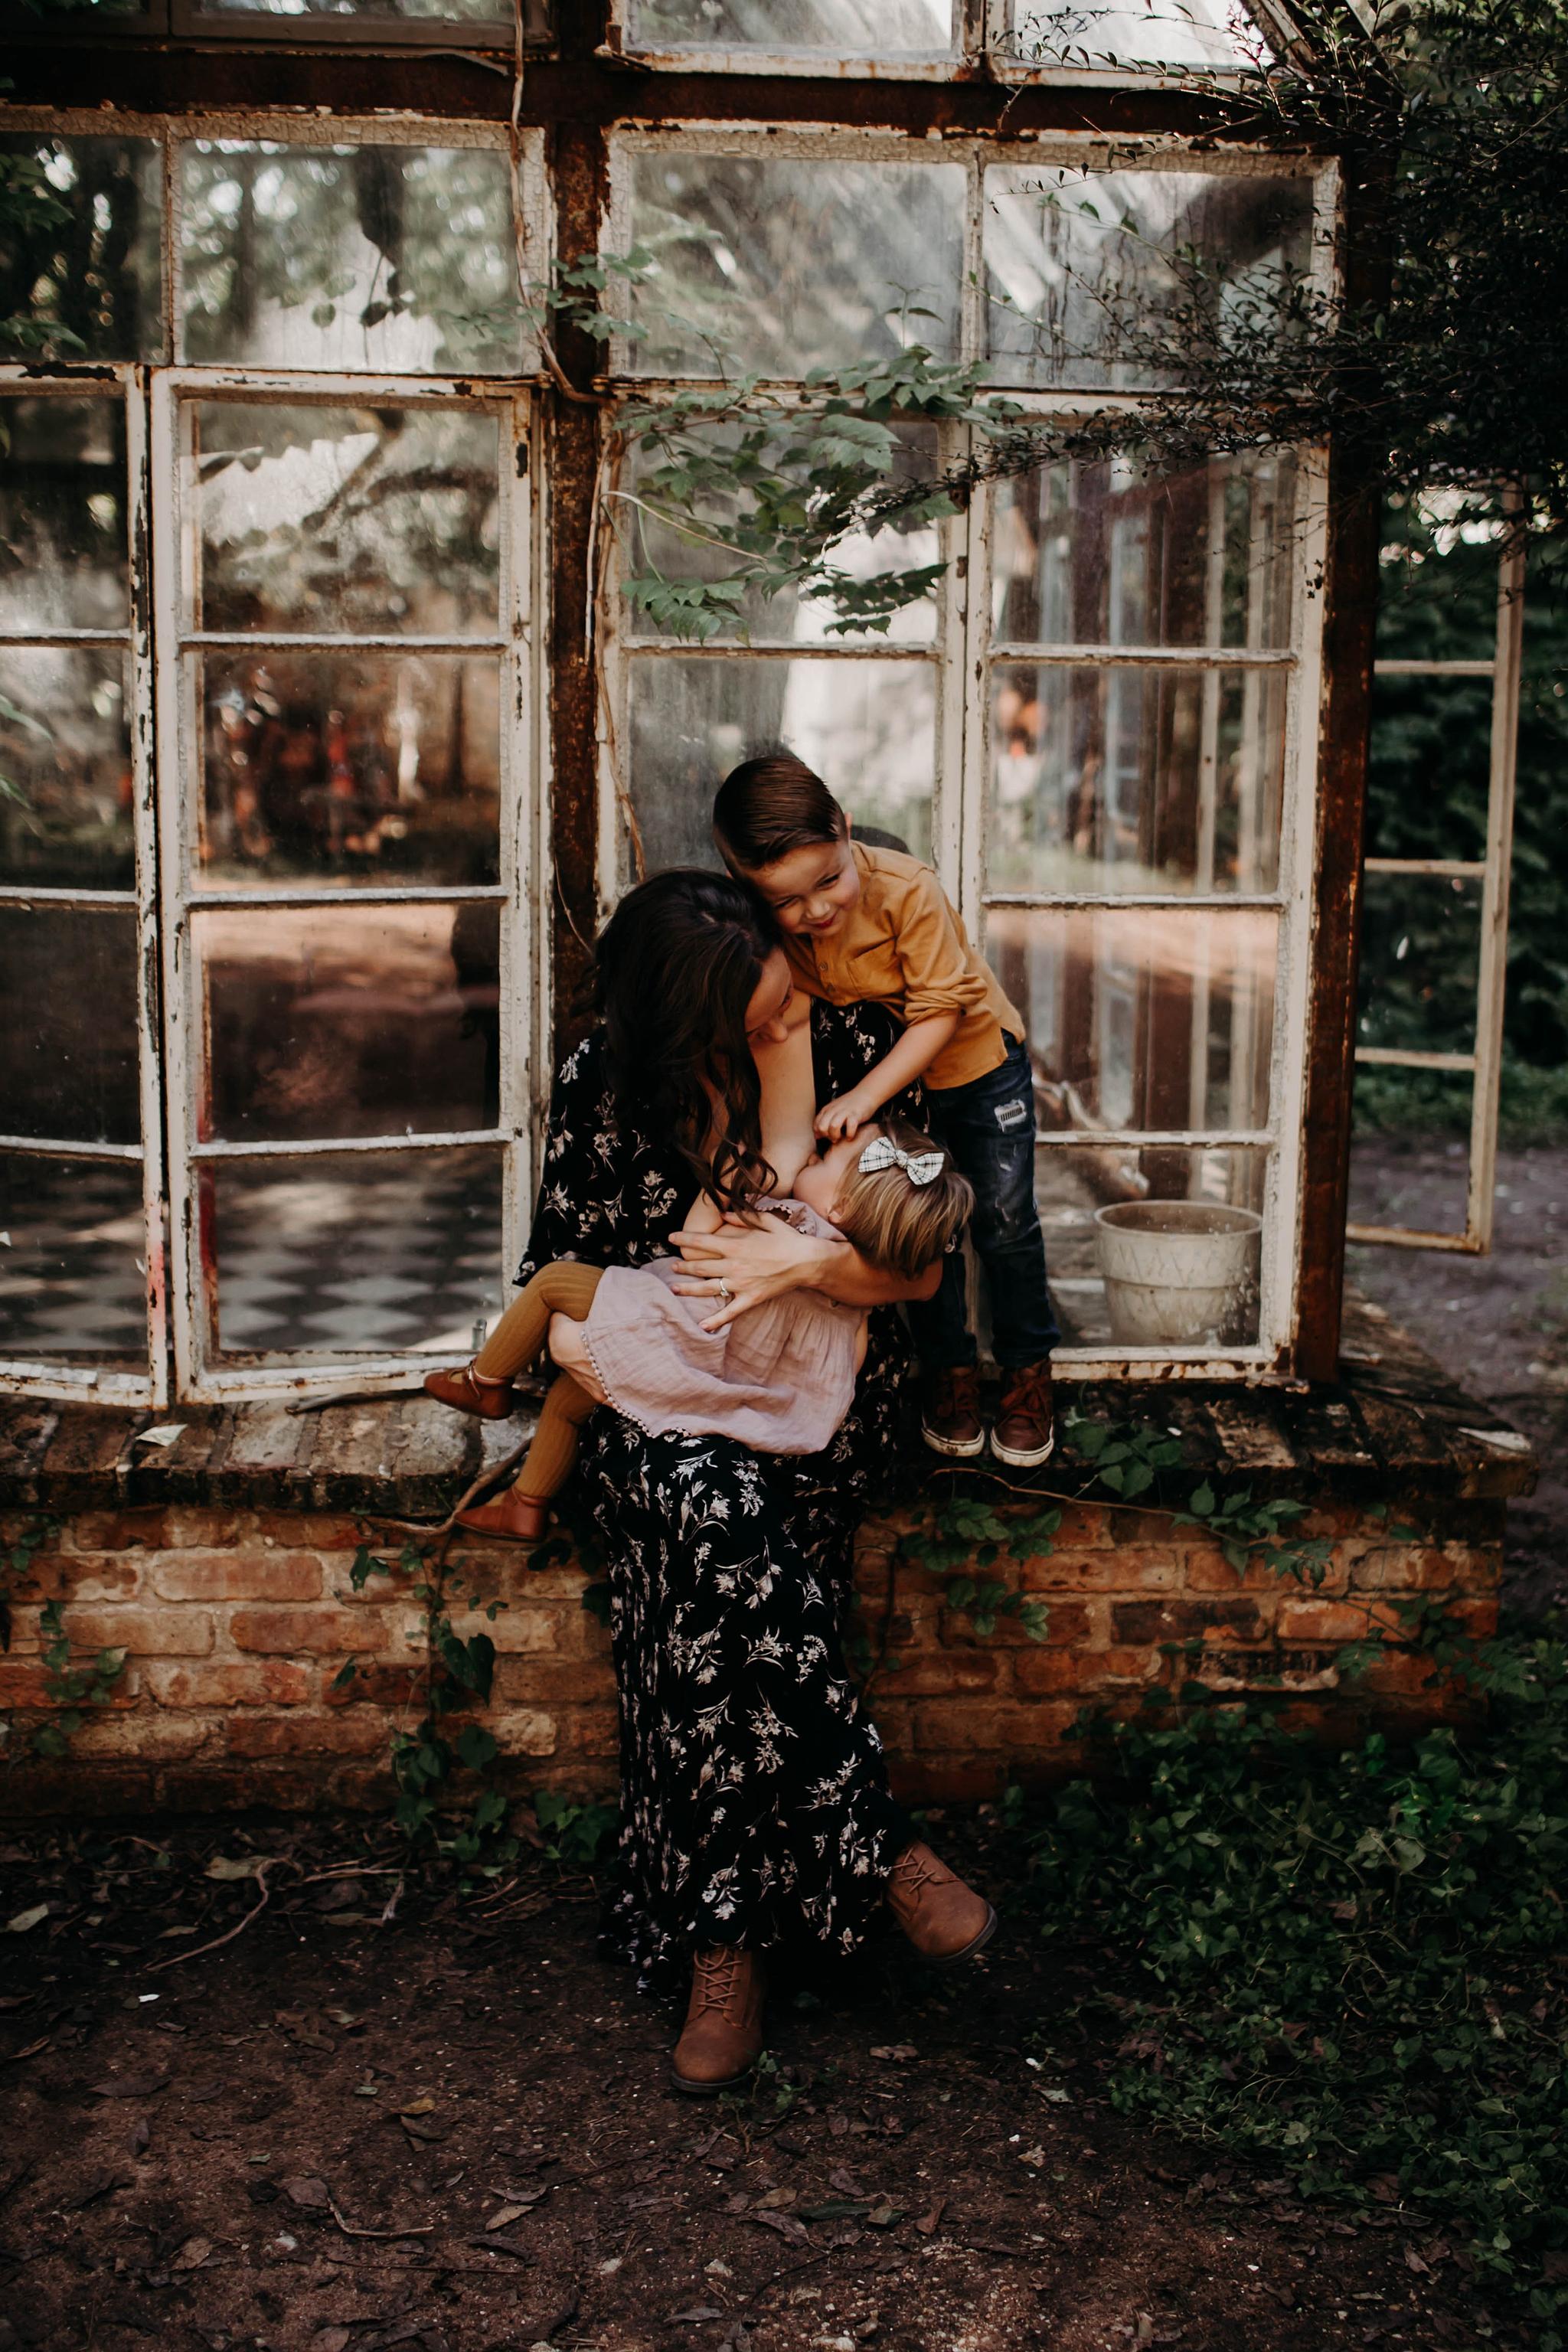 Luera-VMP-San-Antonio-Family-Photography-25_WEB.jpg